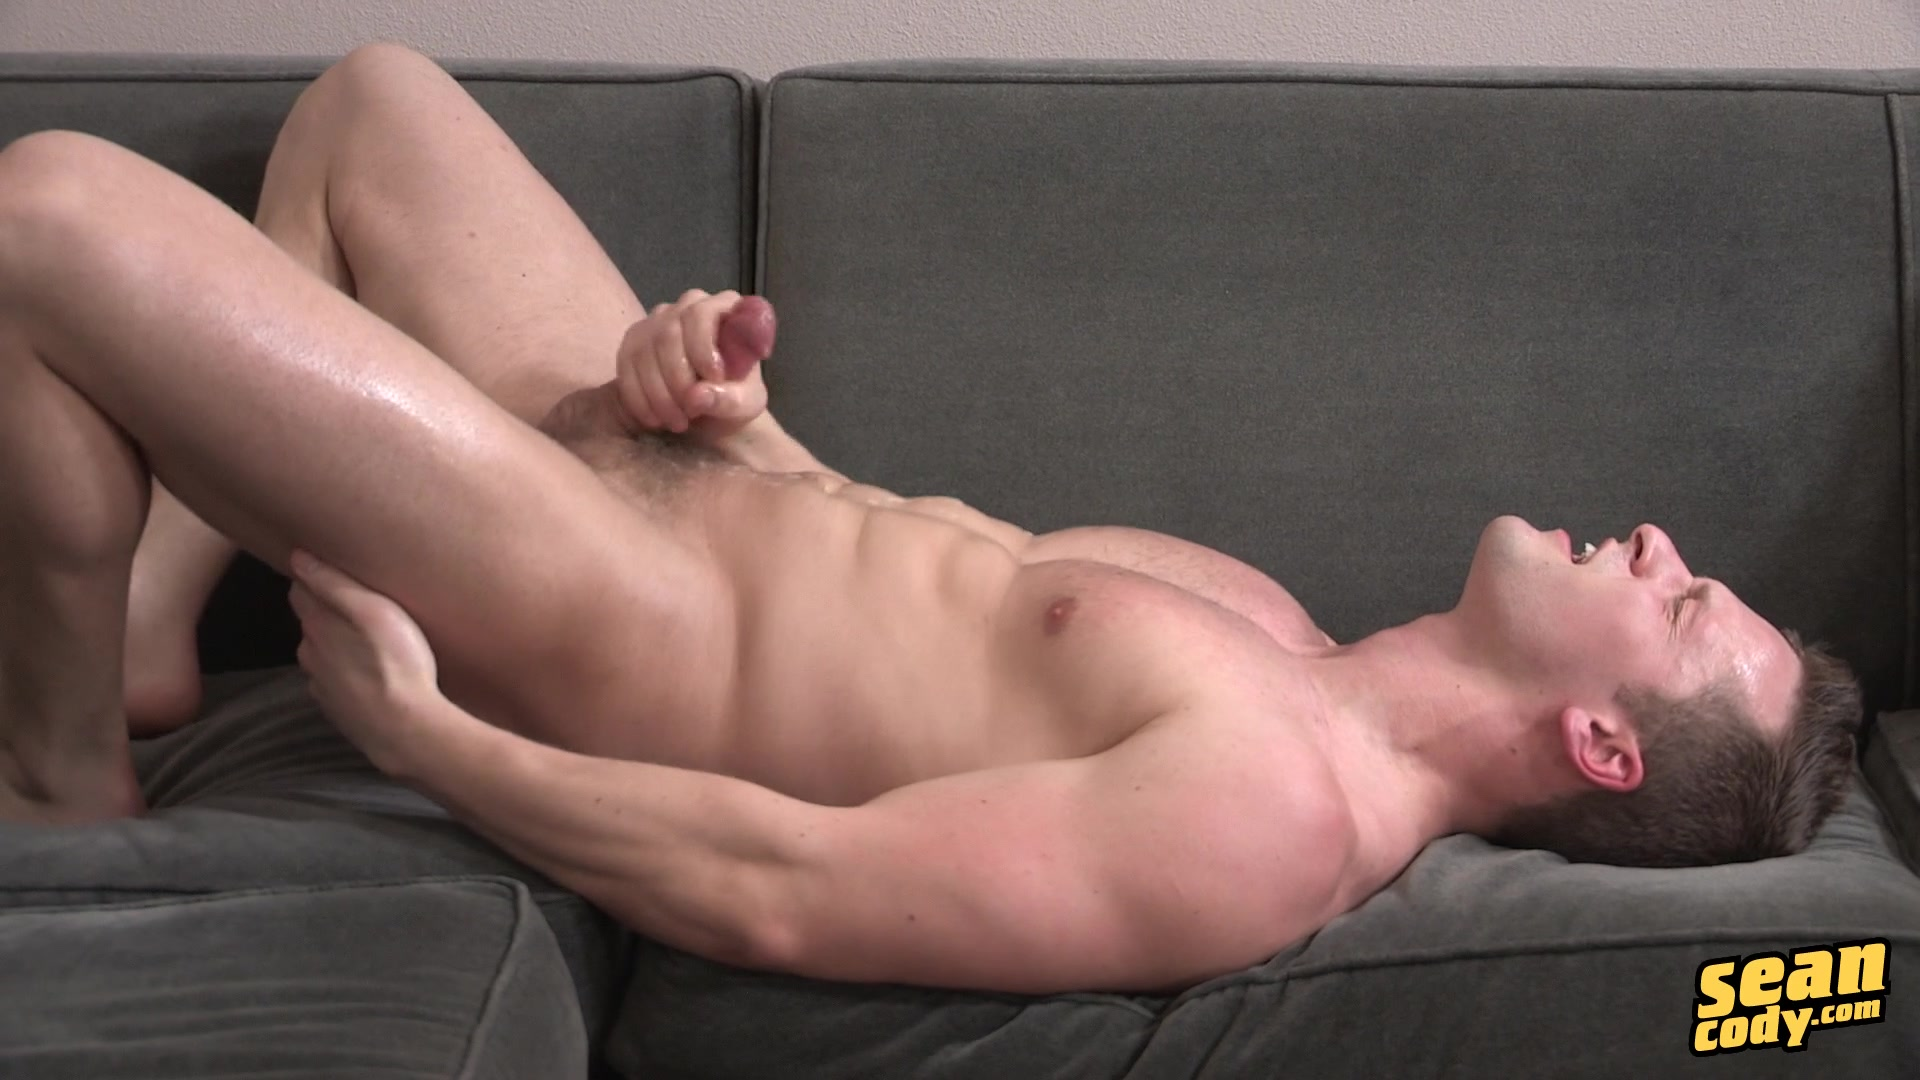 Medical Fetish Porn Videos